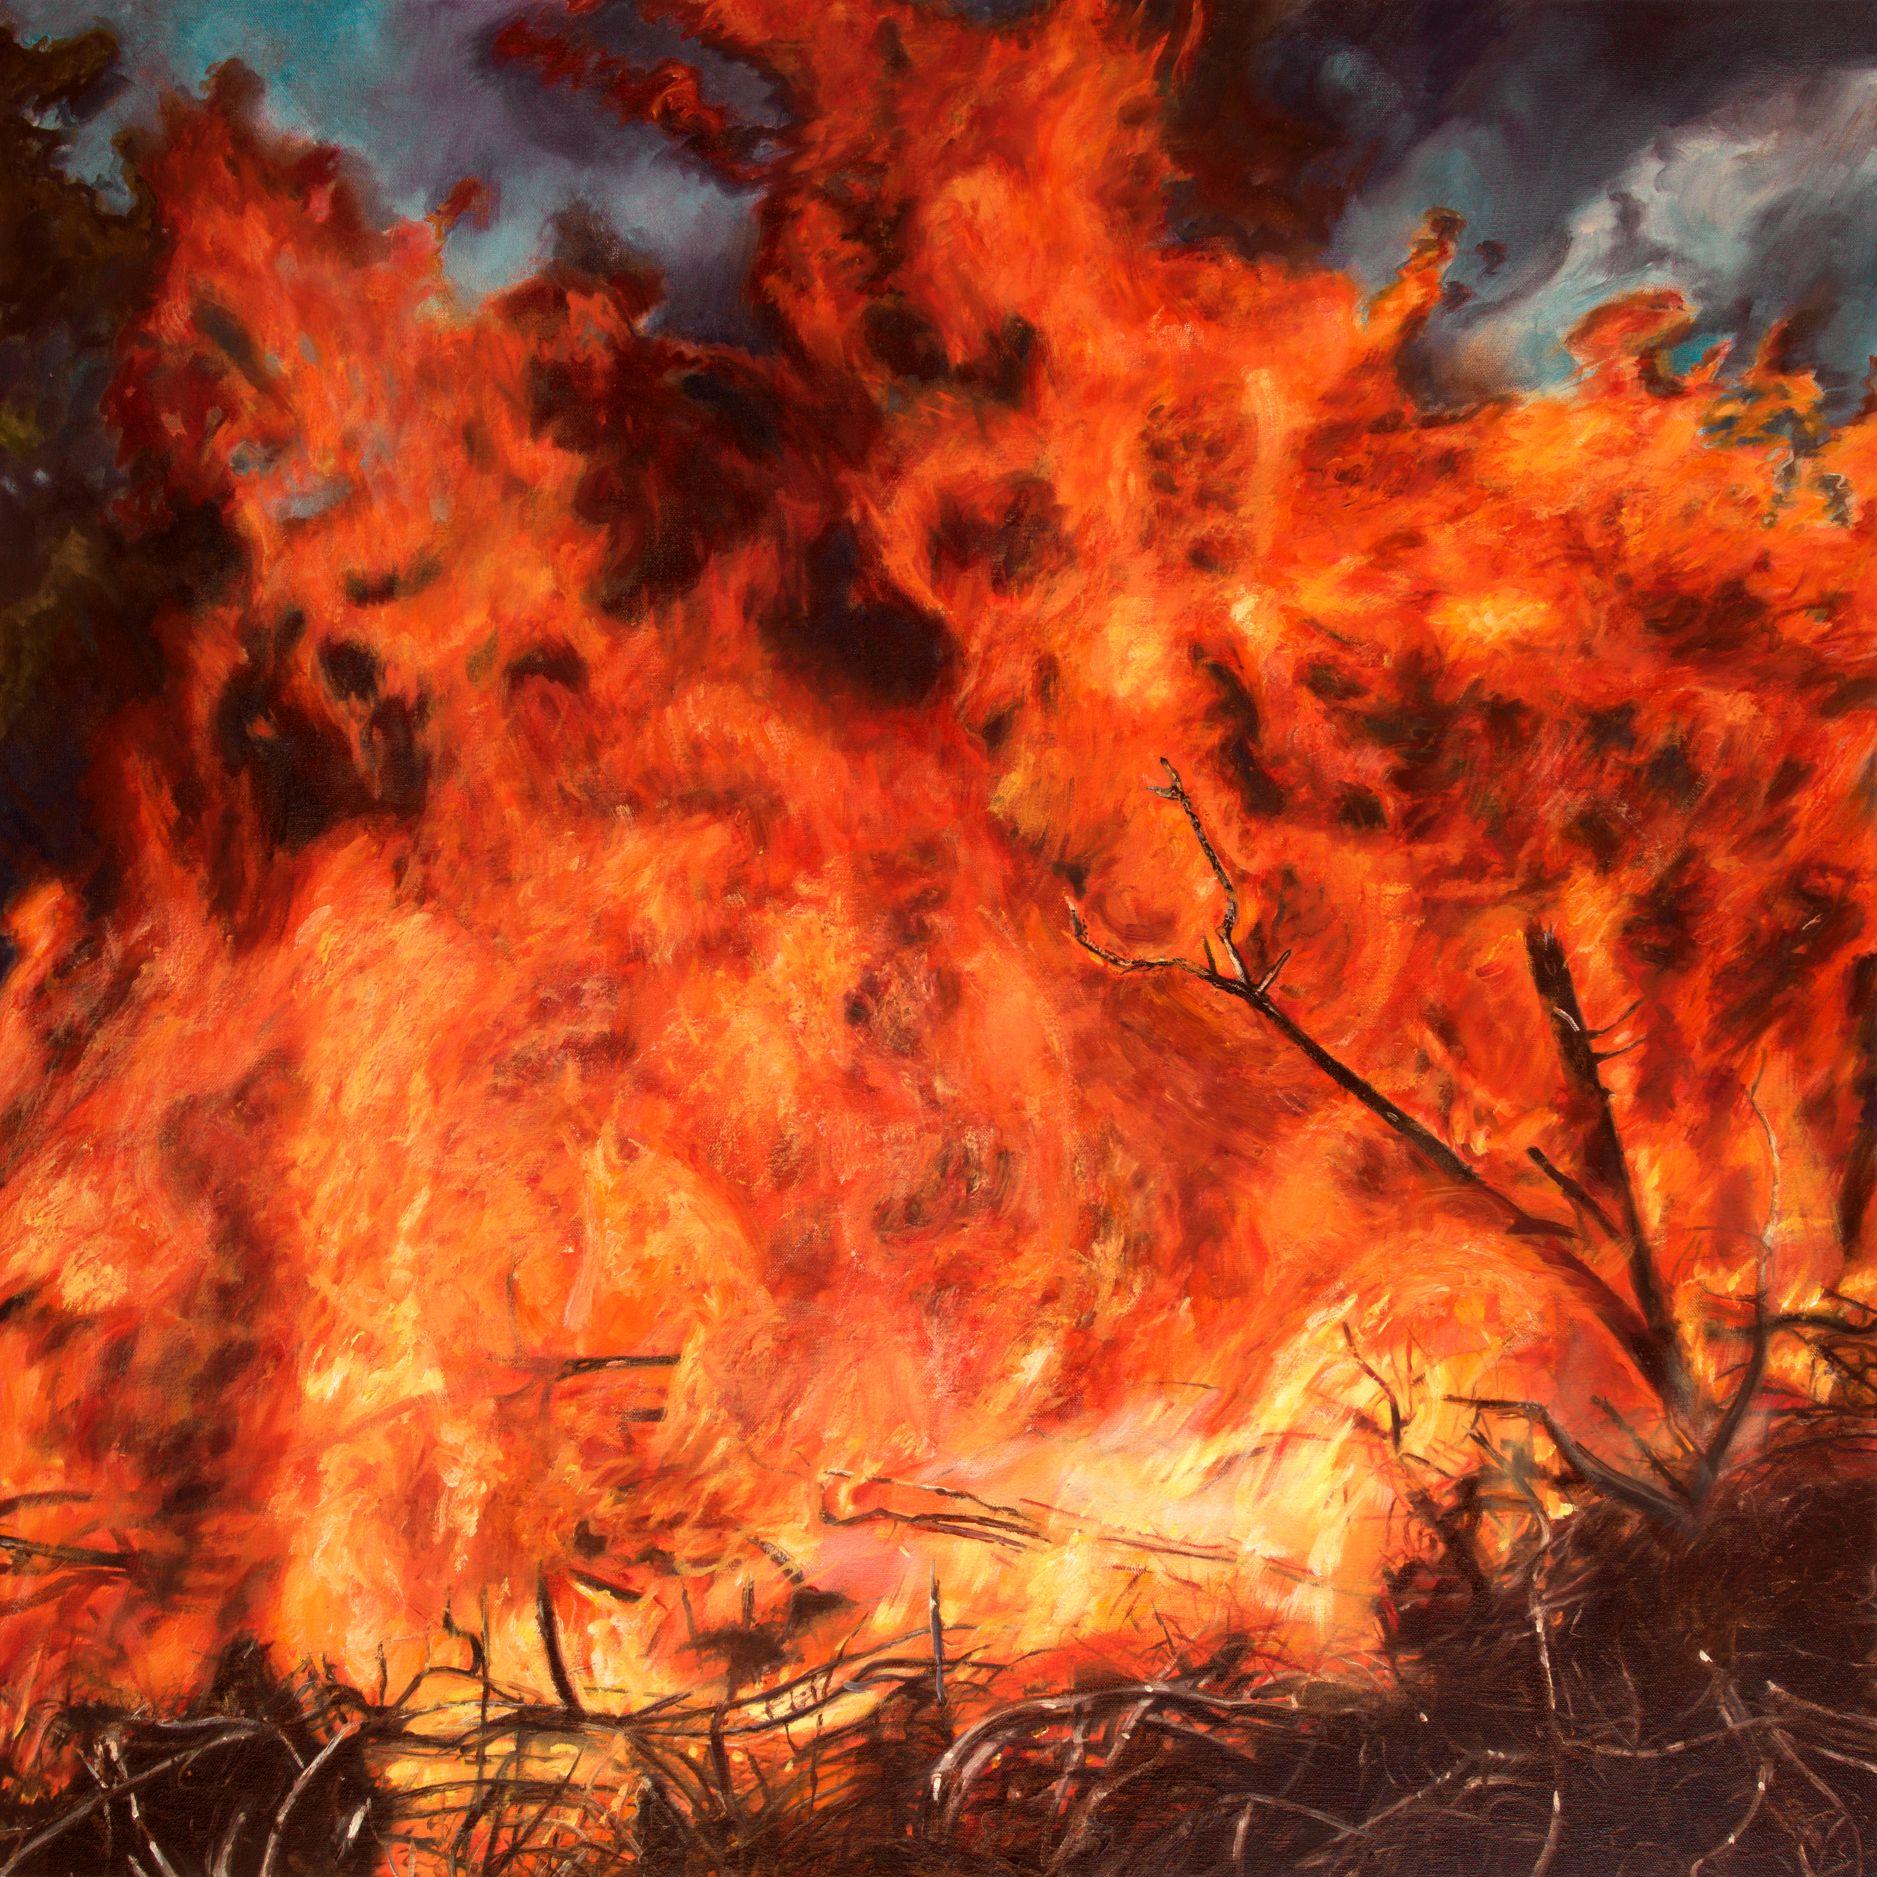 JENNIFER WALTON Conflagration, 2016, Oil on canvas, 30 x 30 inches, 76 x 76 cm